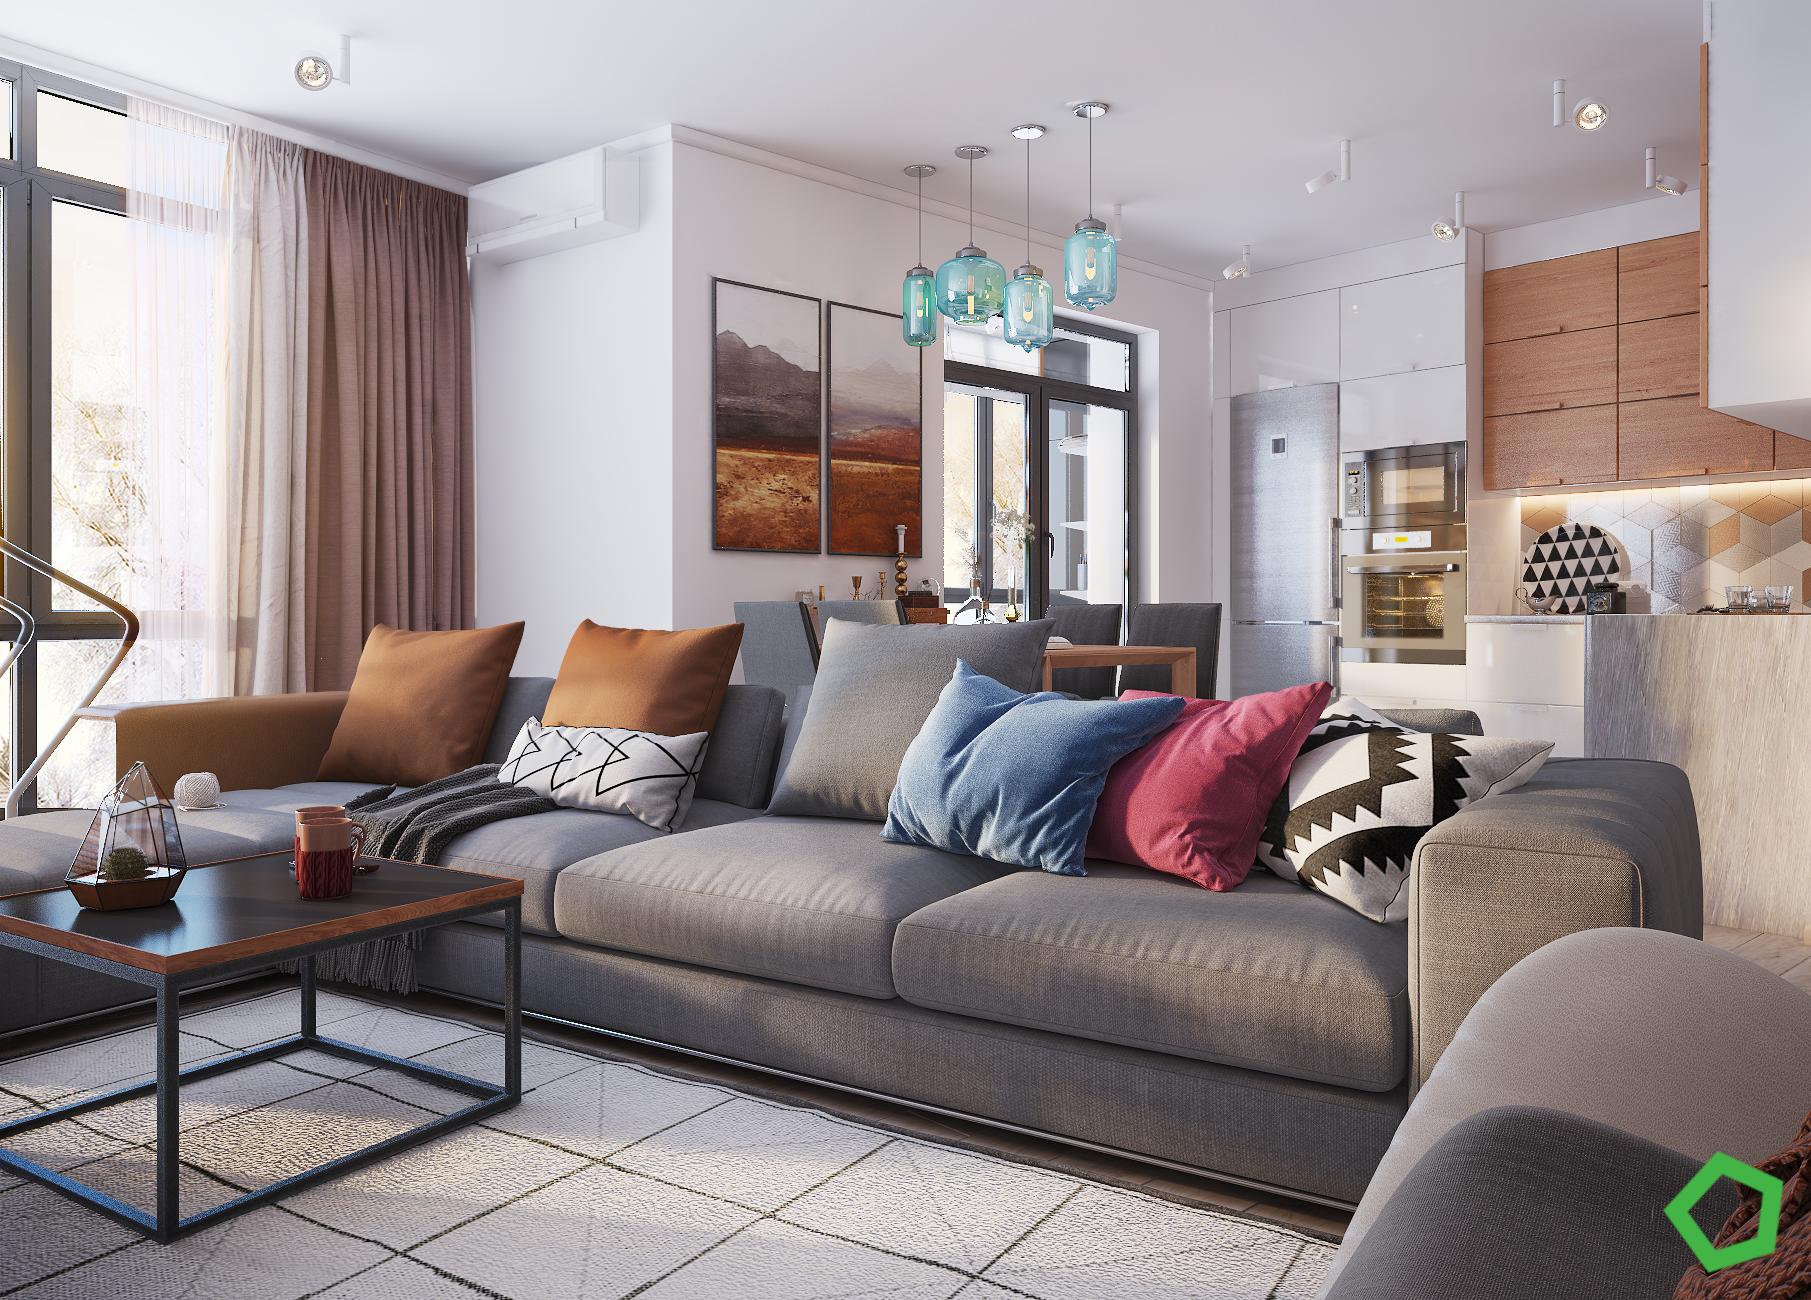 Rustam apartament on Behance